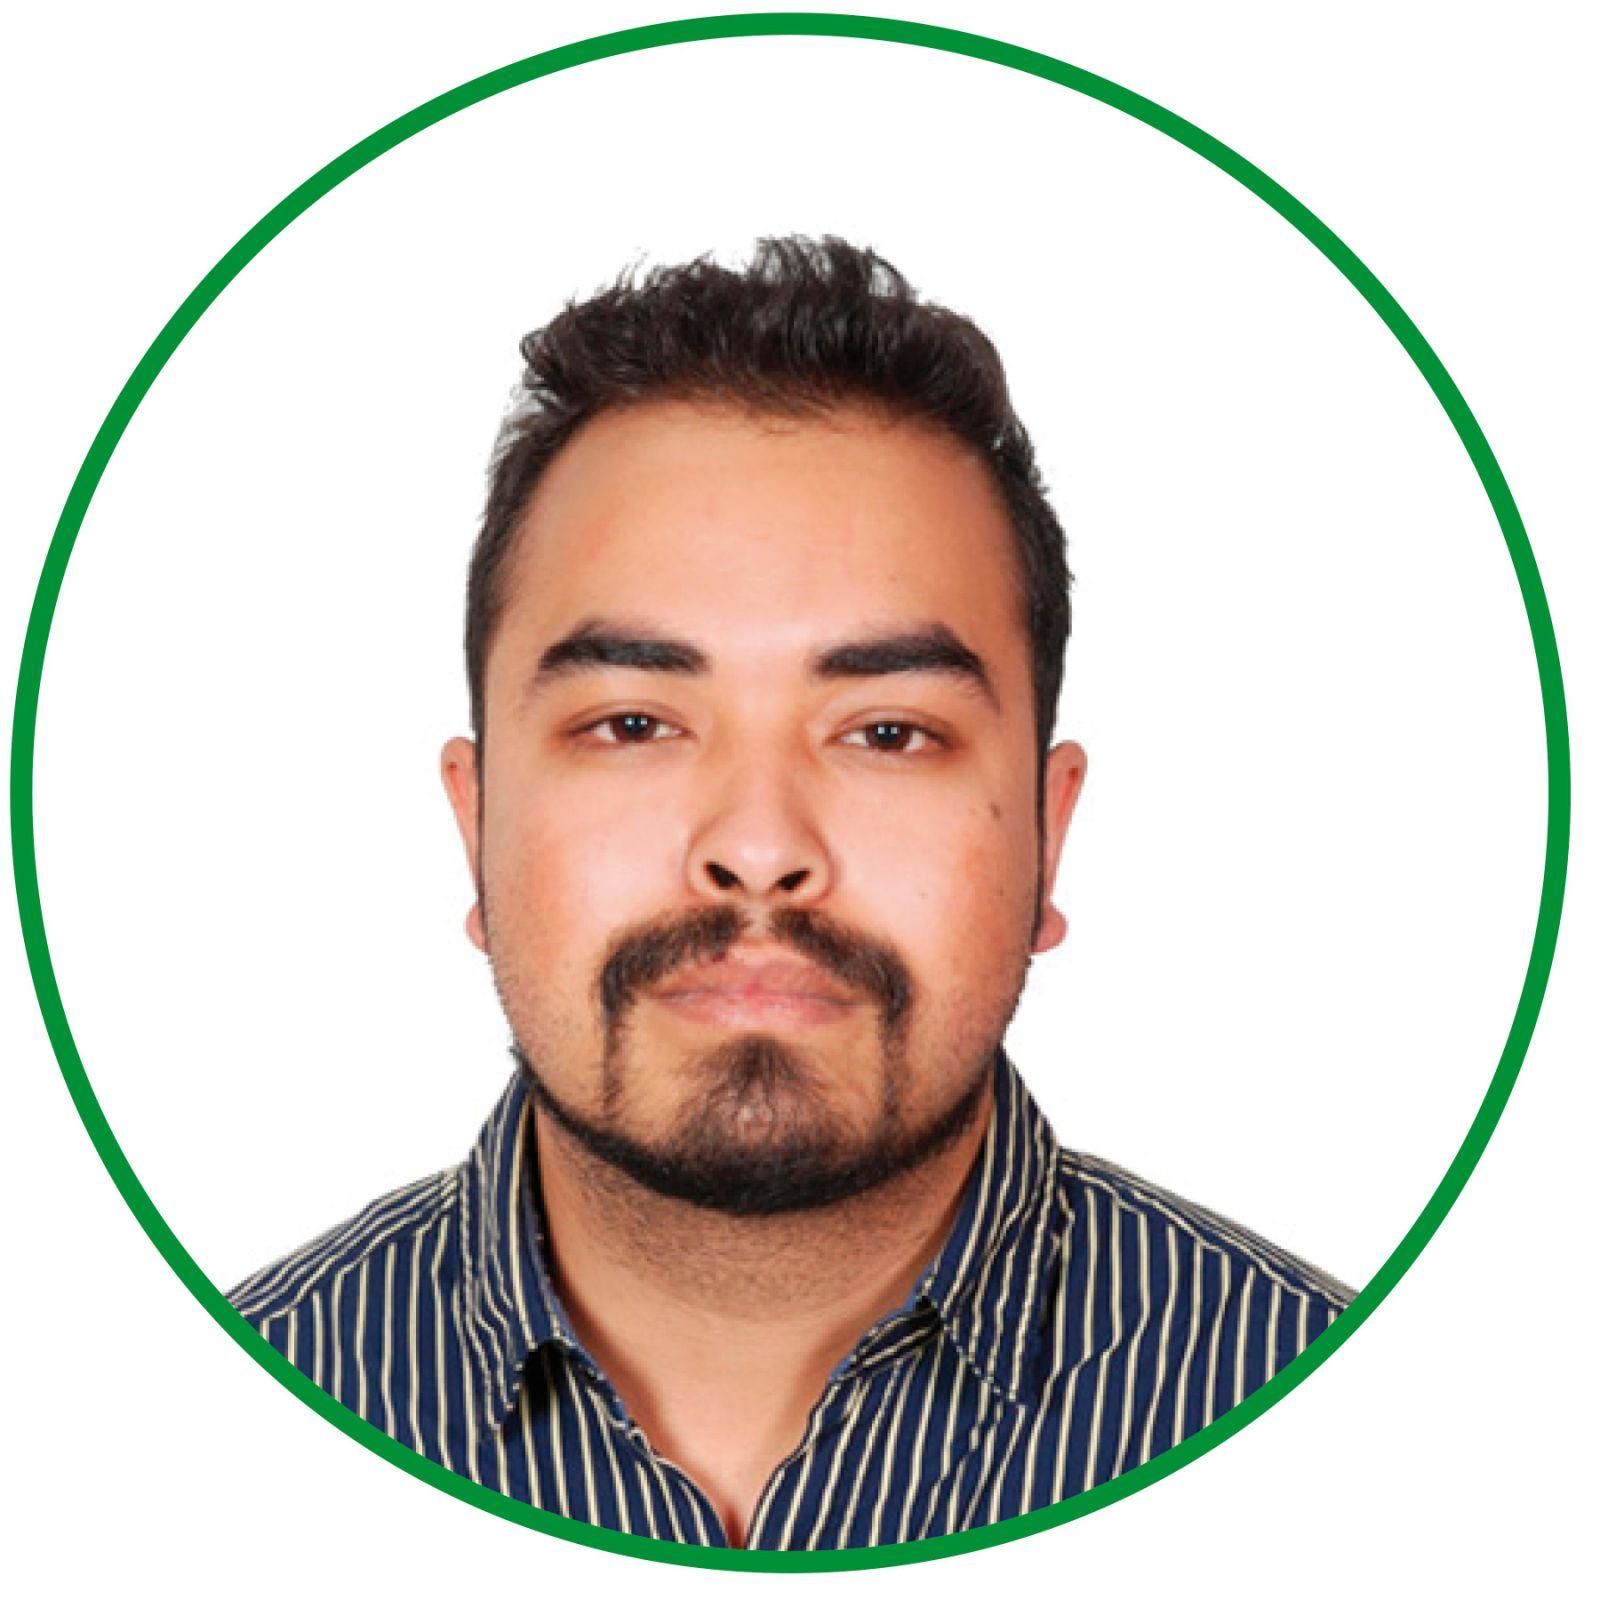 Mr. Manindra Shrestha